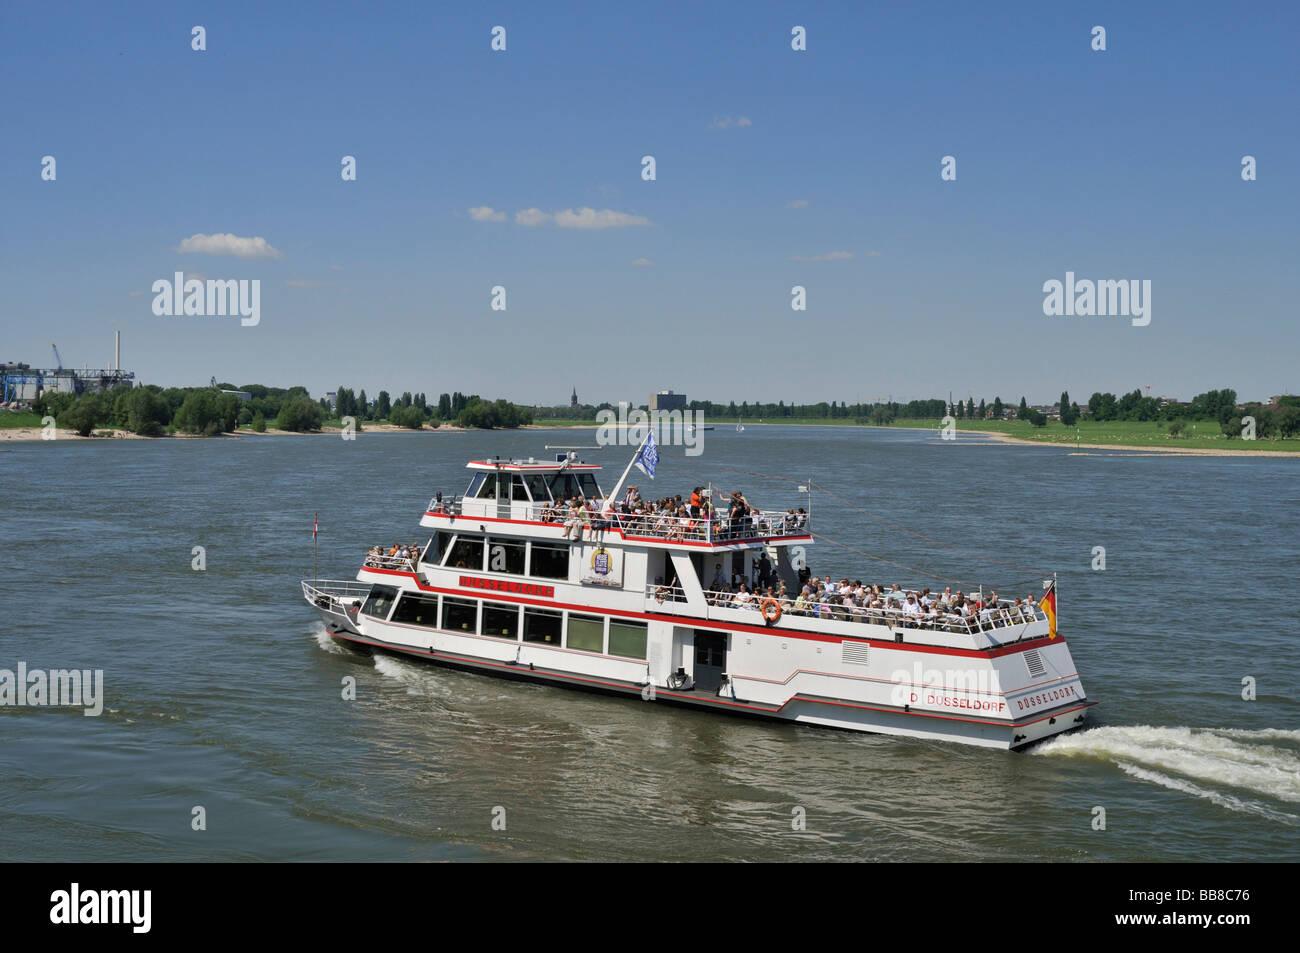 Fully occupied passenger ship, Duesseldorf, Weisse Flotte, white fleet, Rhine, North Rhine-Westphalia, Germany, - Stock Image